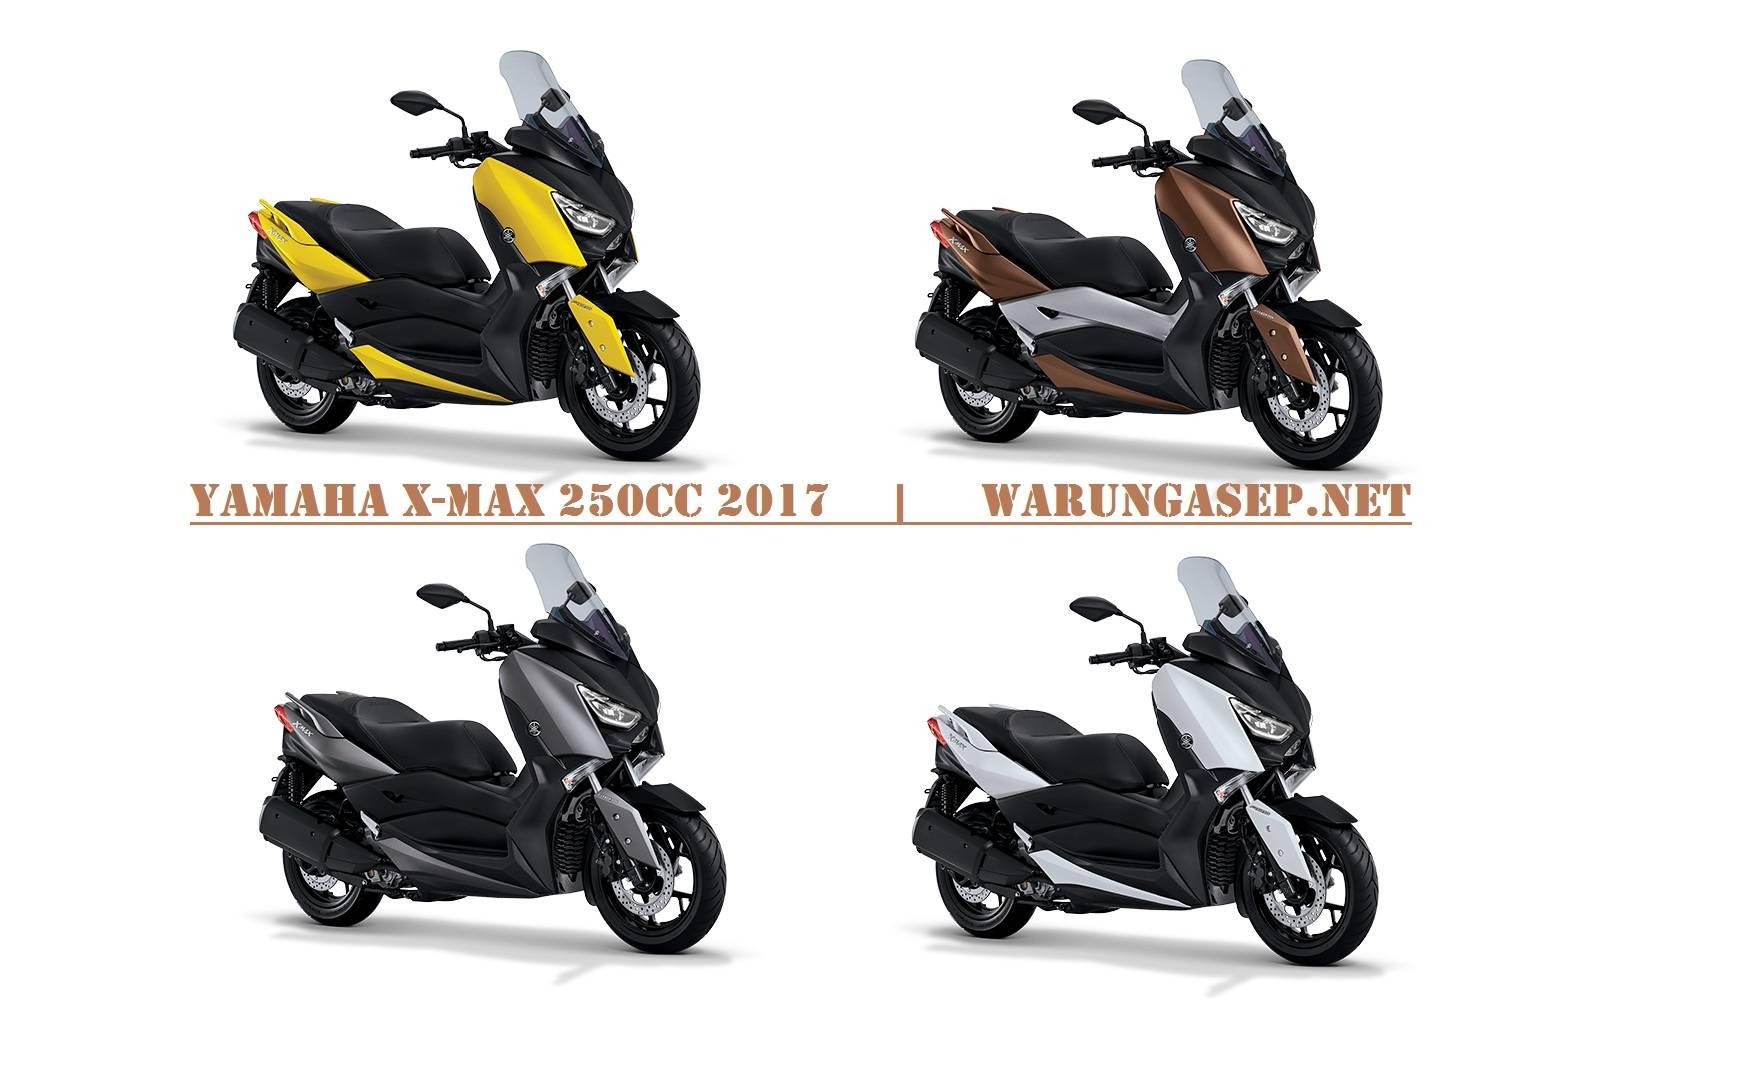 Foto 4 Pilihan Warna Yamaha XMax 250cc 2017 Ada Warna